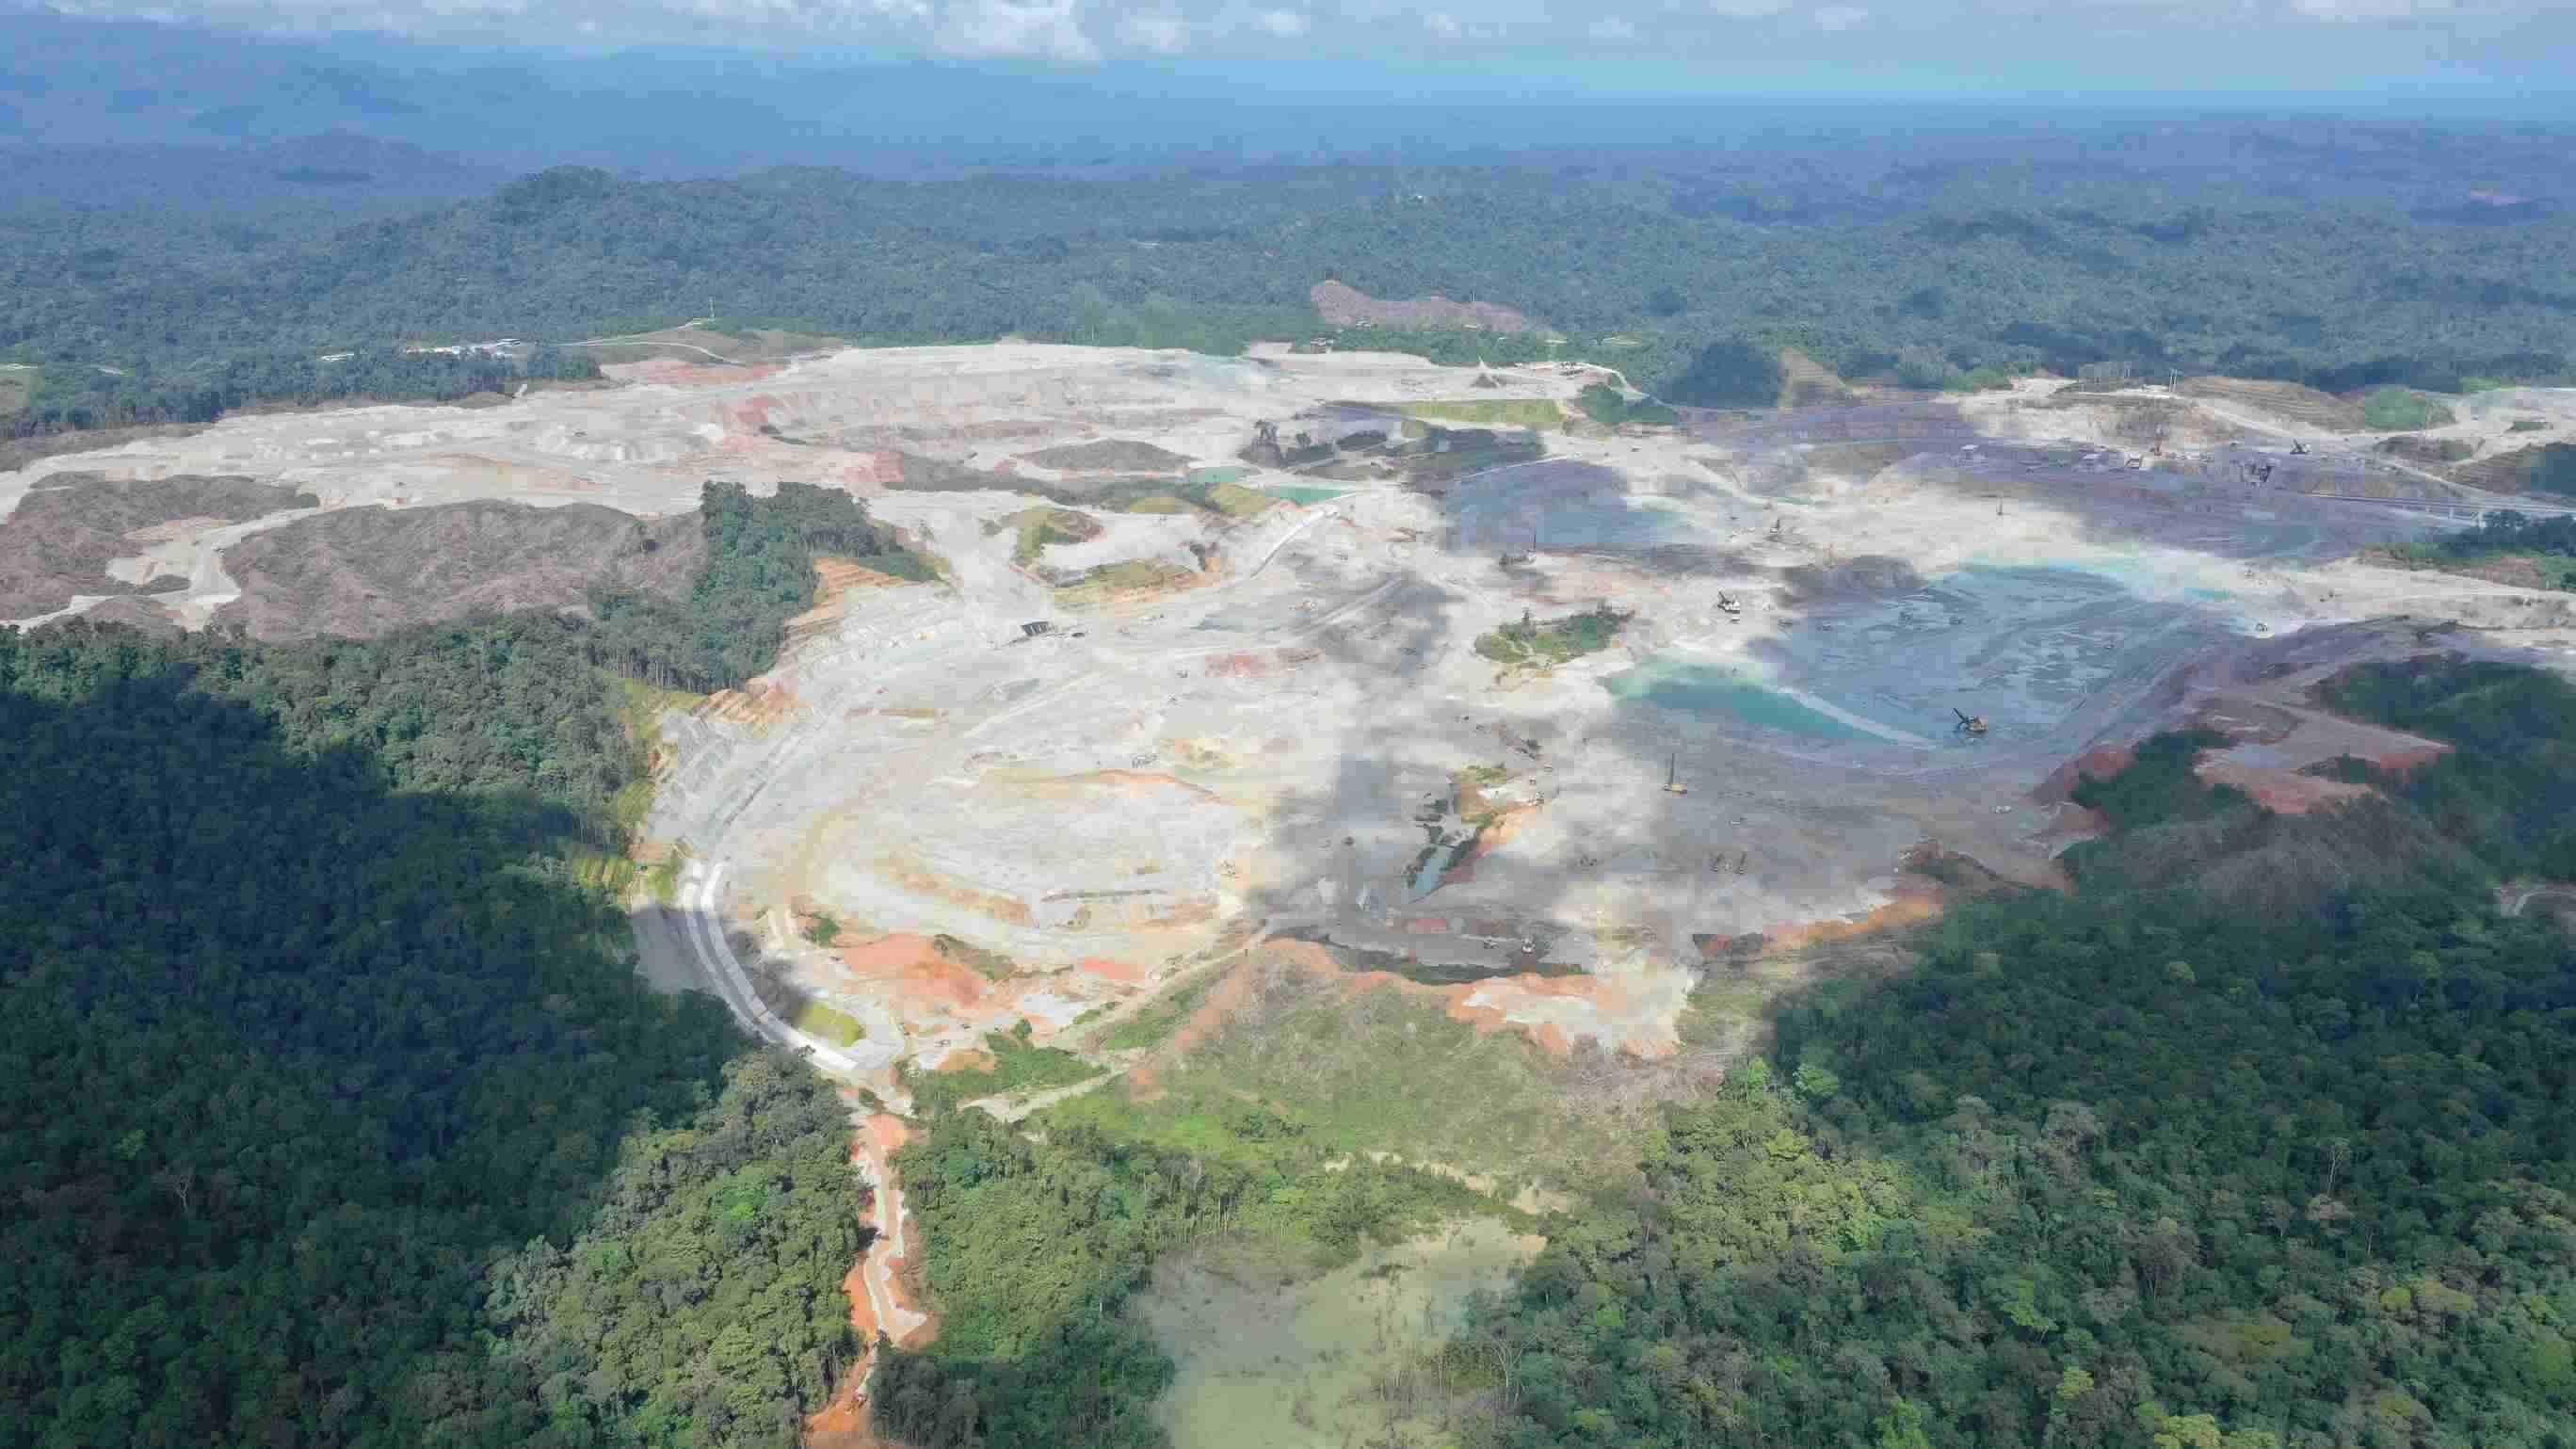 COVID-19 hits mining megaproject ramp-ups